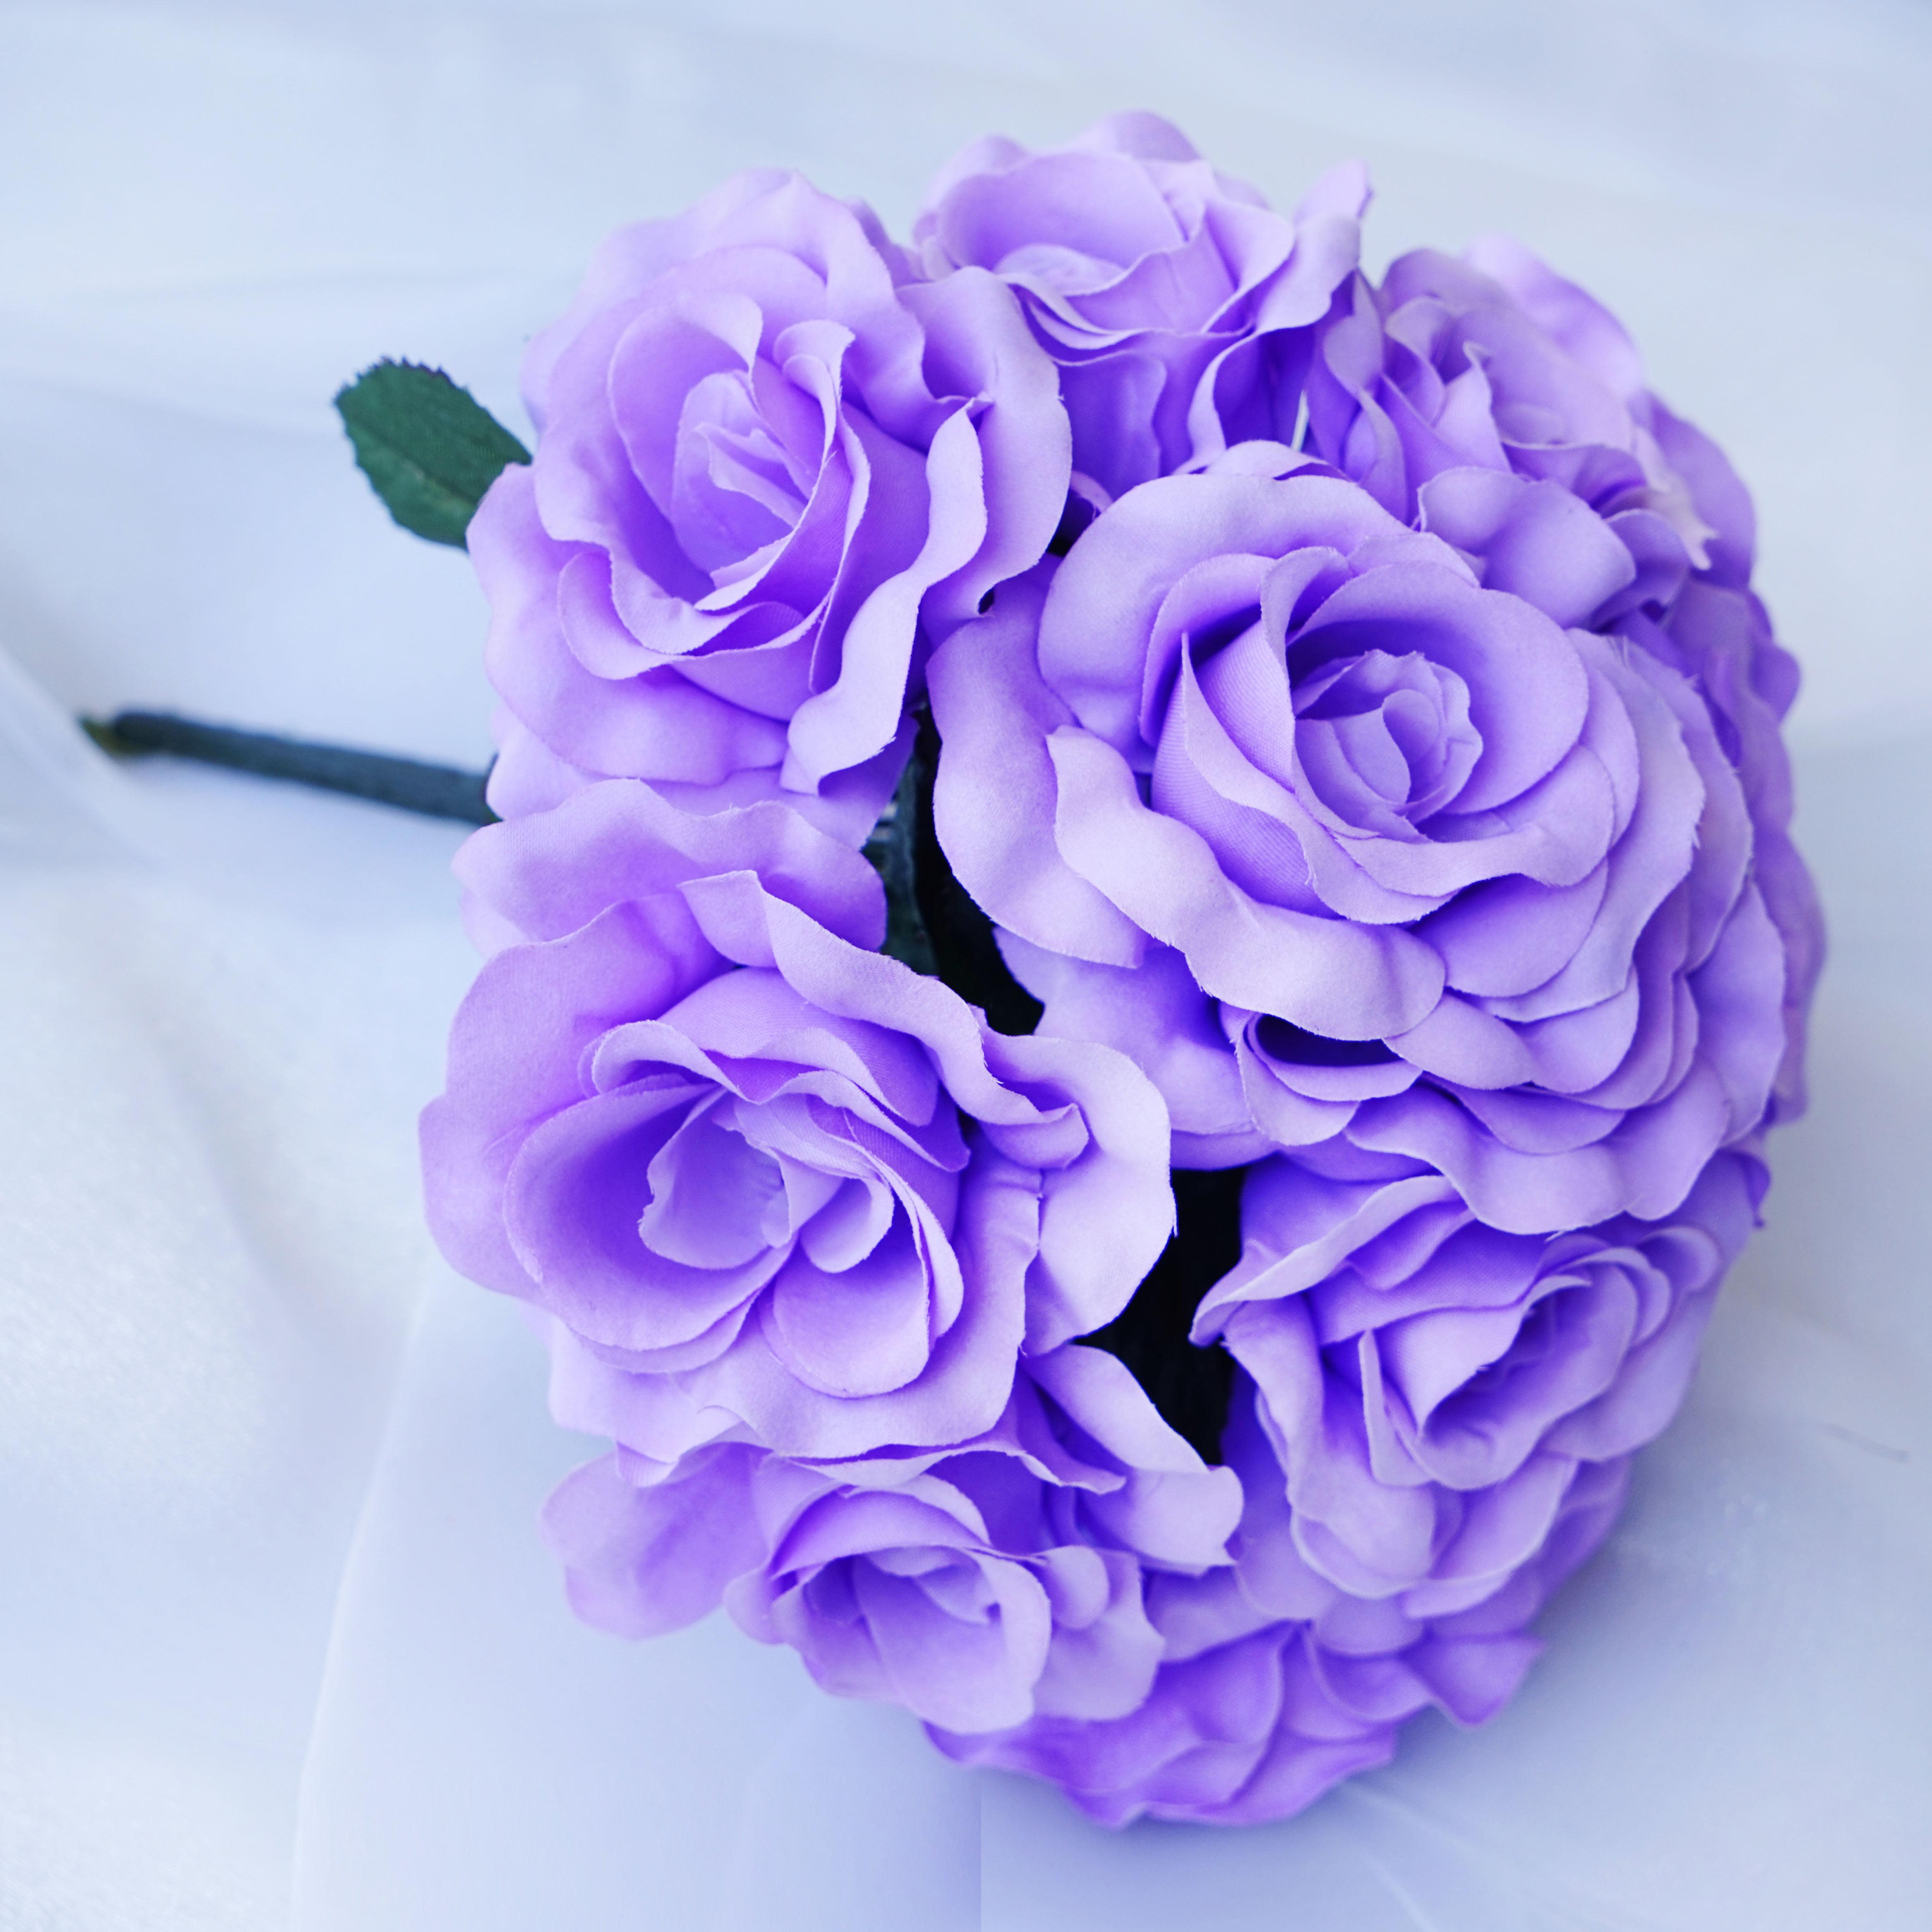 Efavormart 4 Pcs Real Looking Premium Velvet Artificial Roses